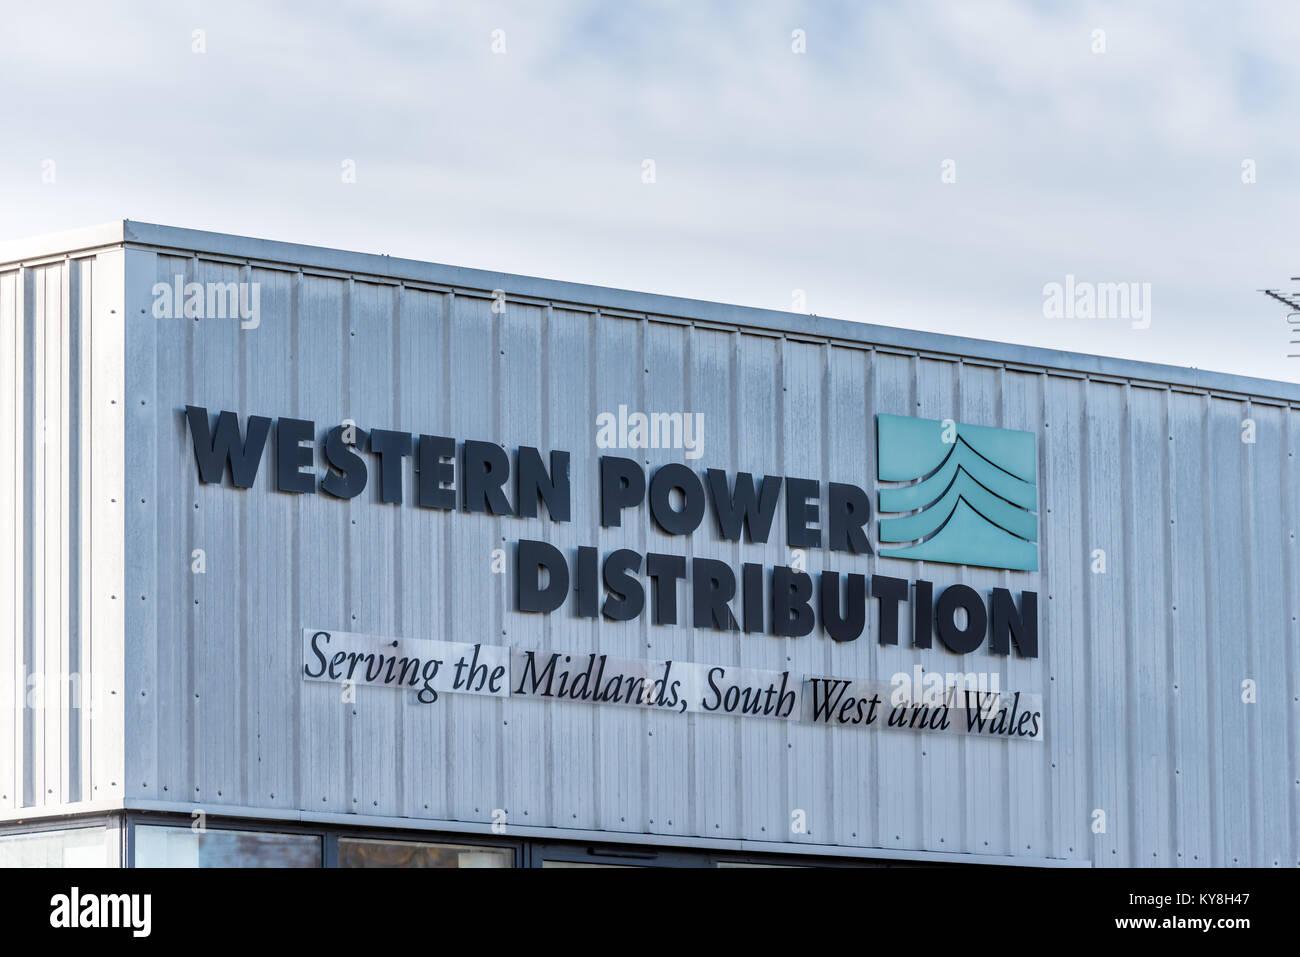 Western Power Distribution Stock Photos & Western Power